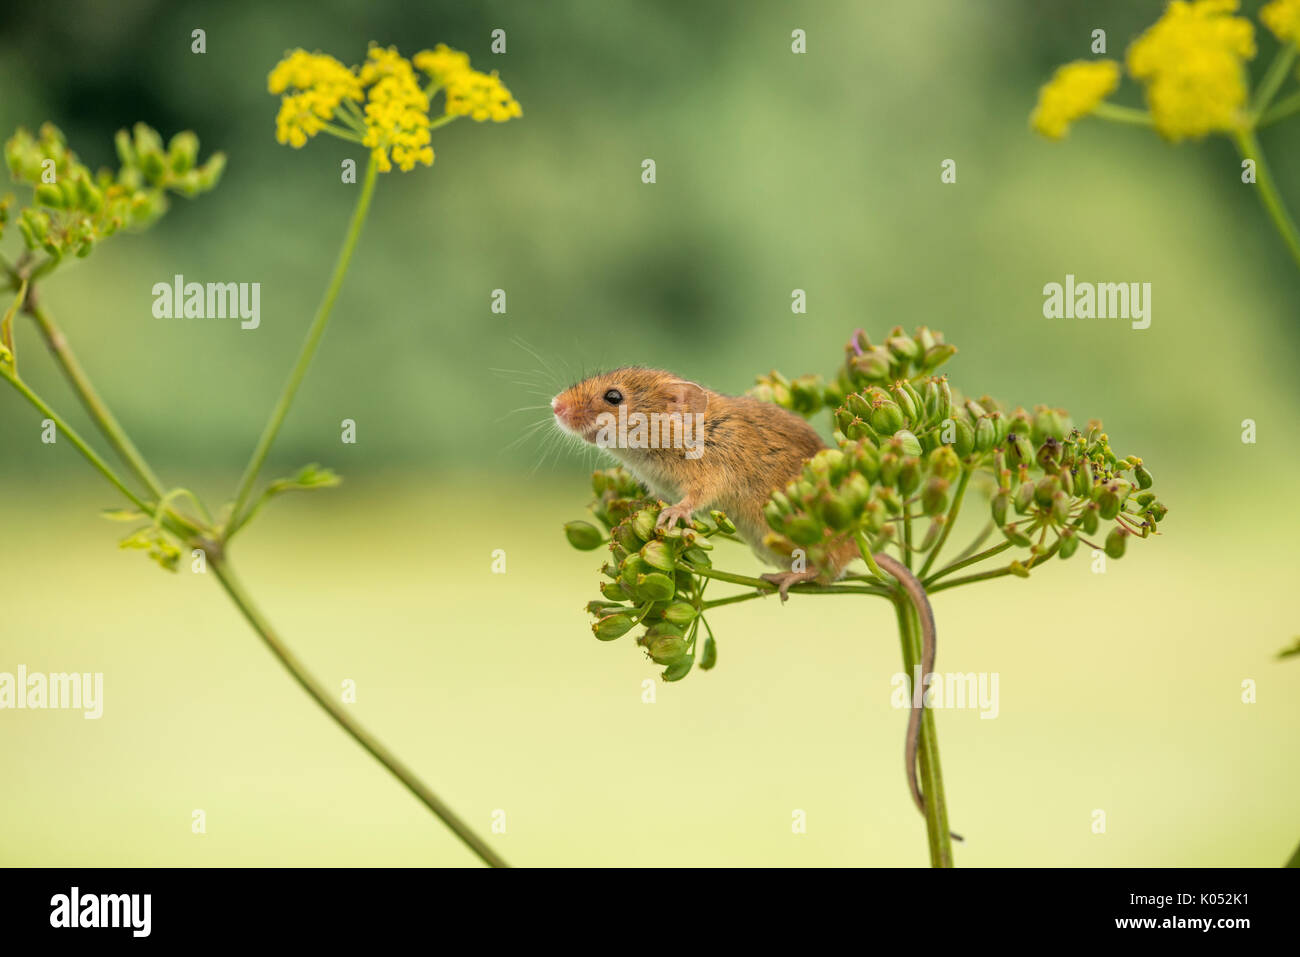 Ernte Maus (Micromys Minutus) auf wilde Pastinake (Pastinaca sativa) Stockbild